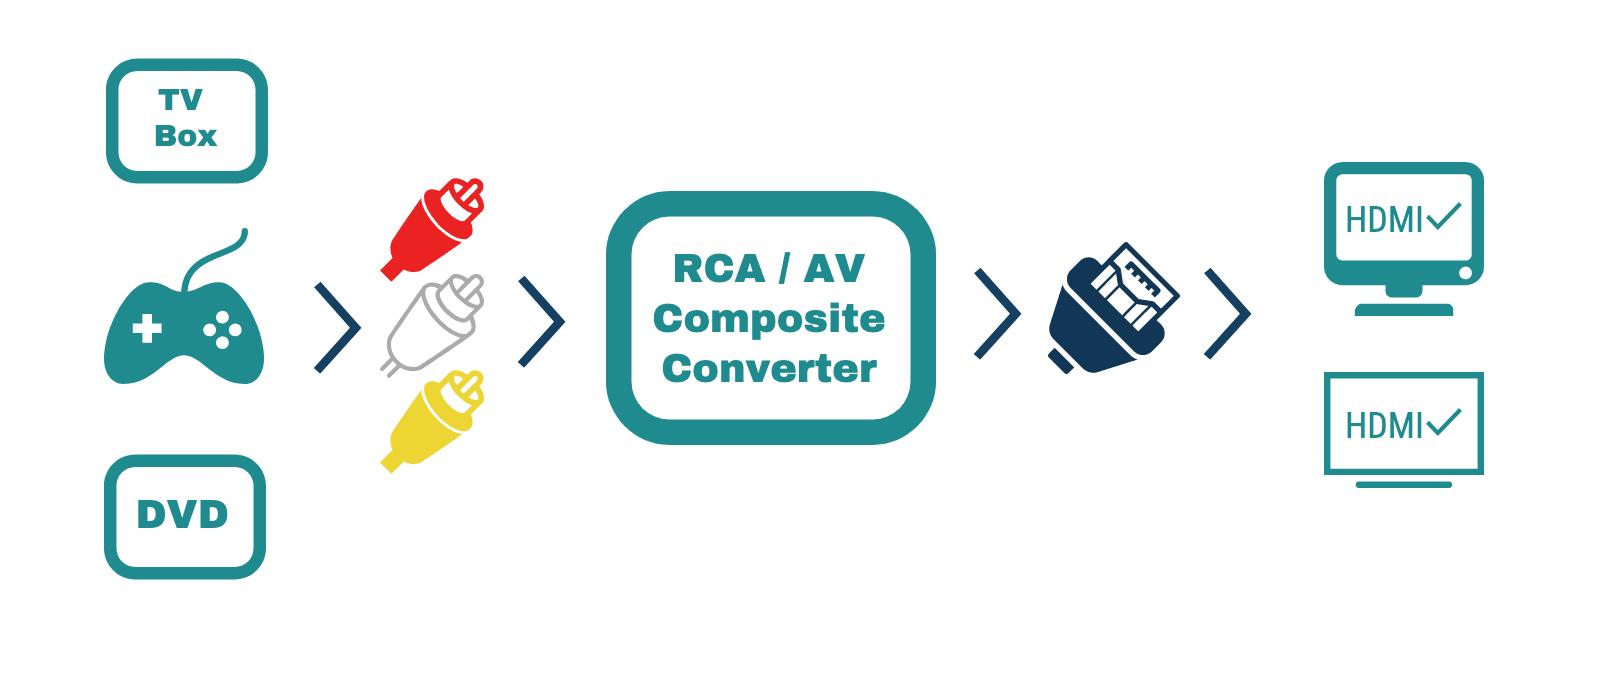 composite converter to hdmi scheme